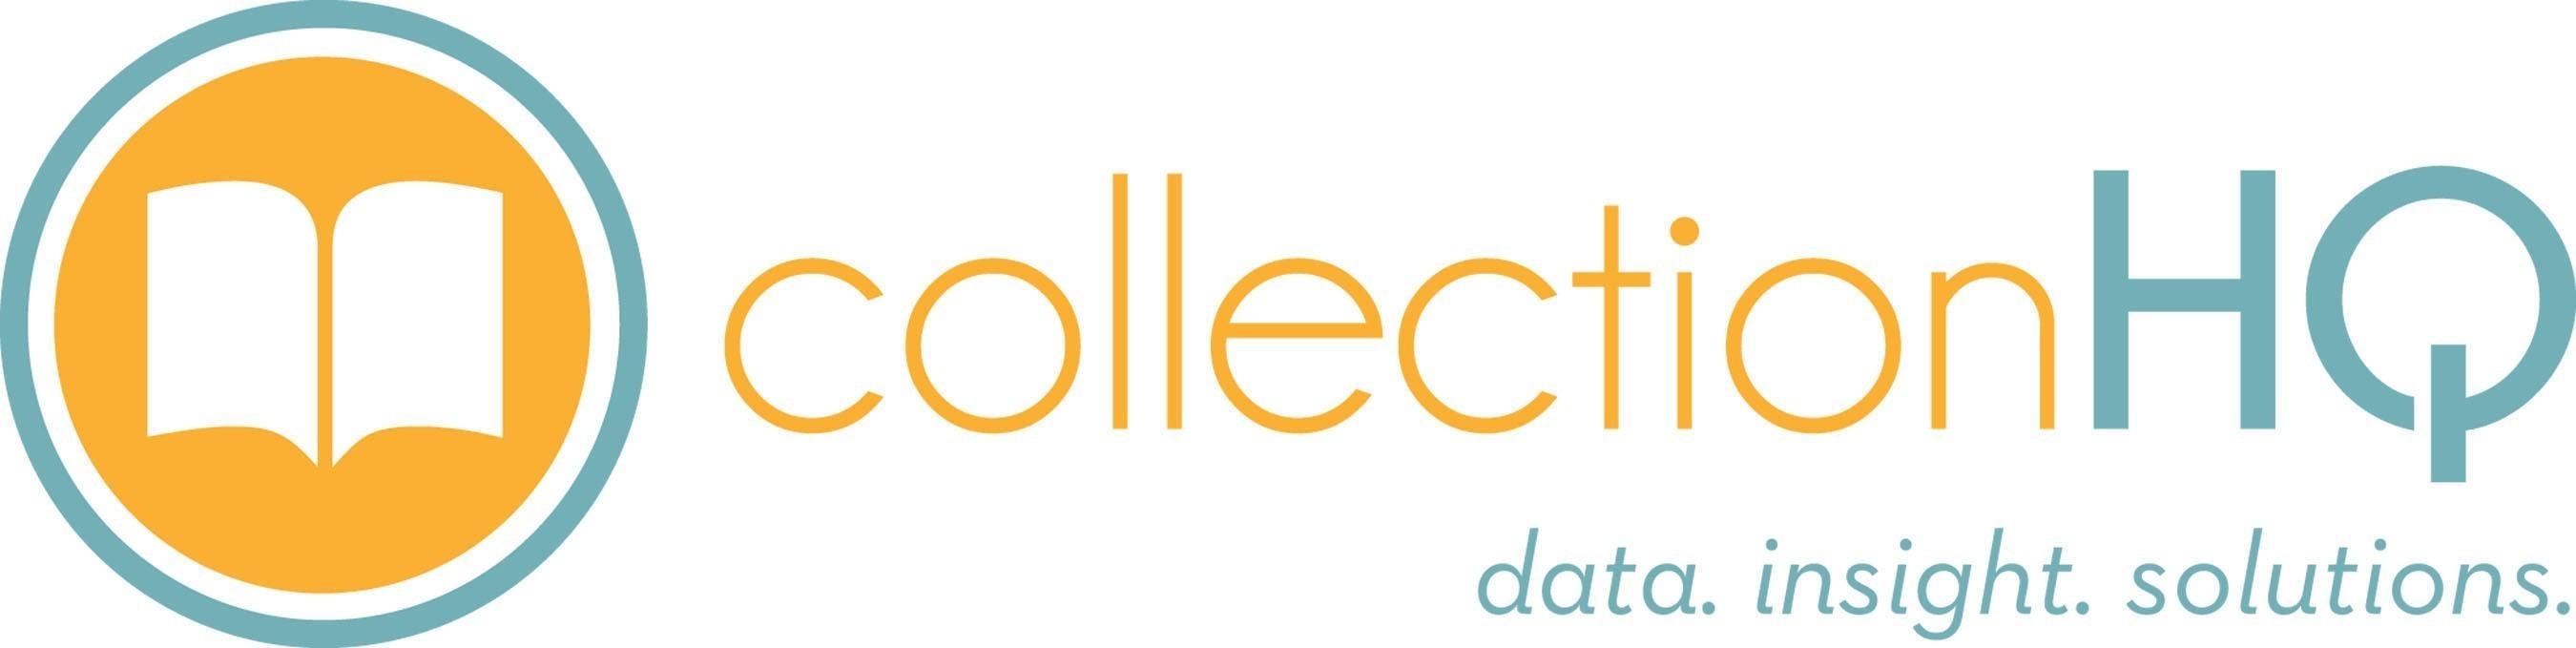 collectionHQ logo